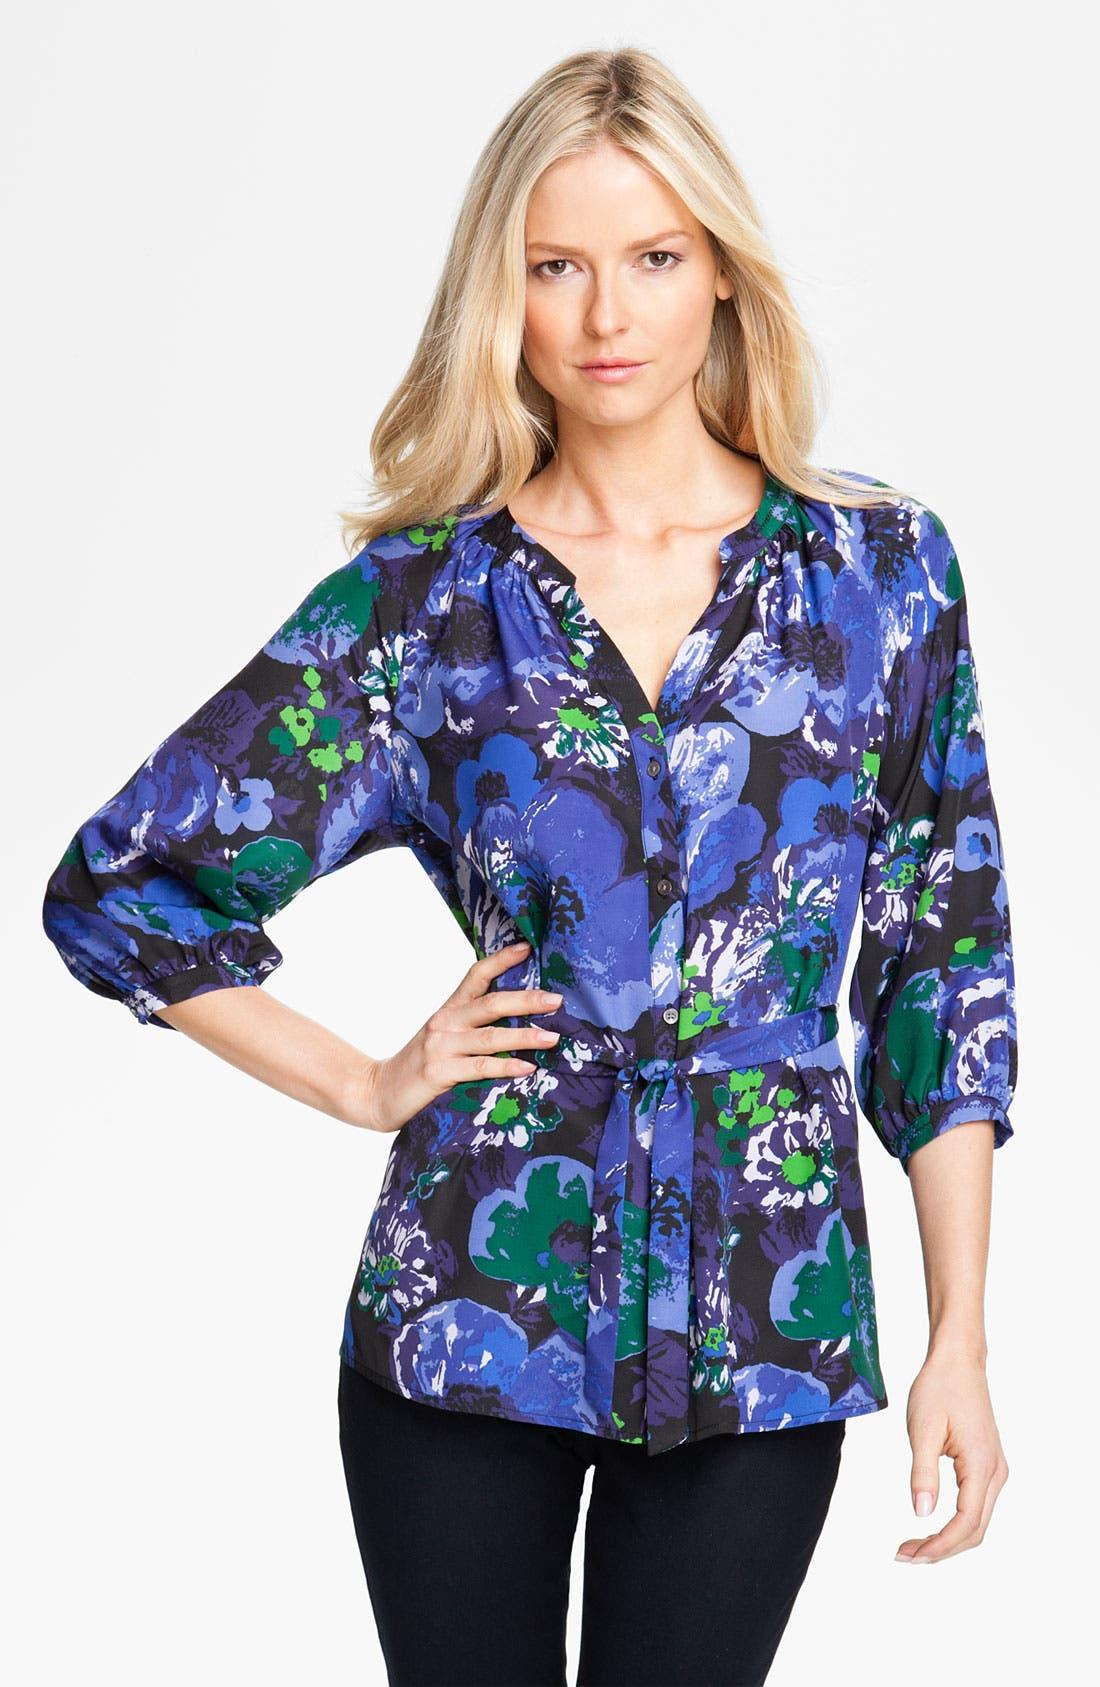 Alternate Image 1 Selected - Isaac Mizrahi Jeans 'Effie' Floral Print Blouse